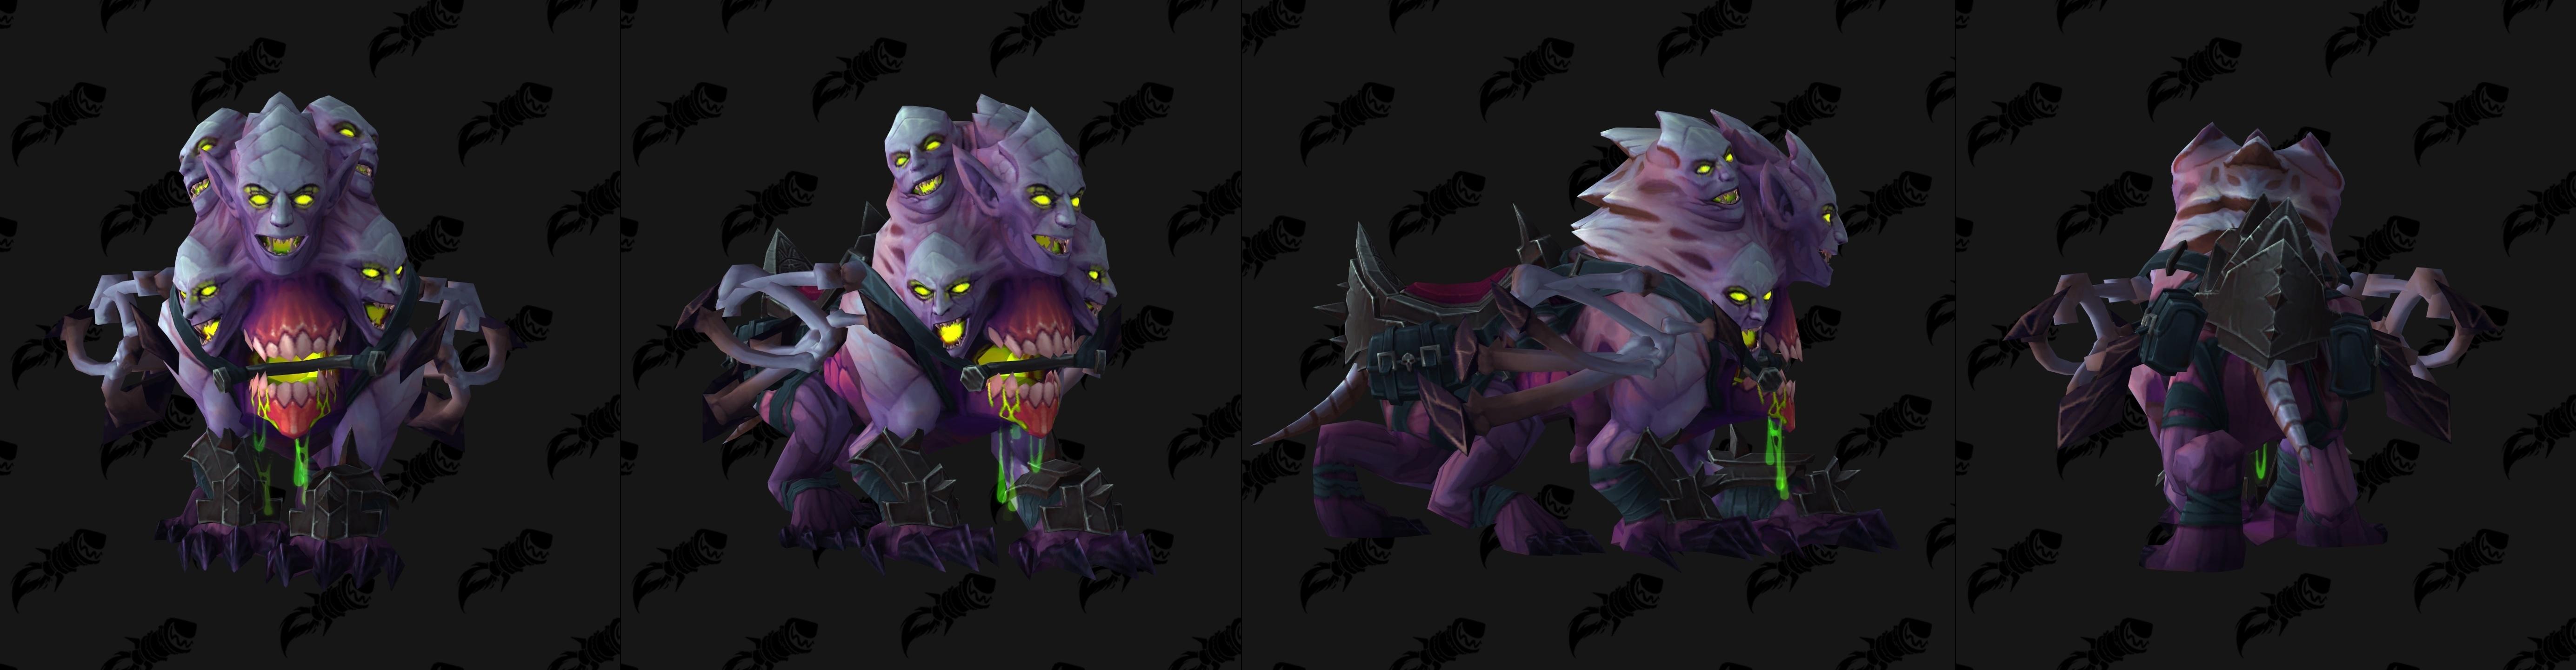 antorus the burning throne raid mount rewards - wowhead news